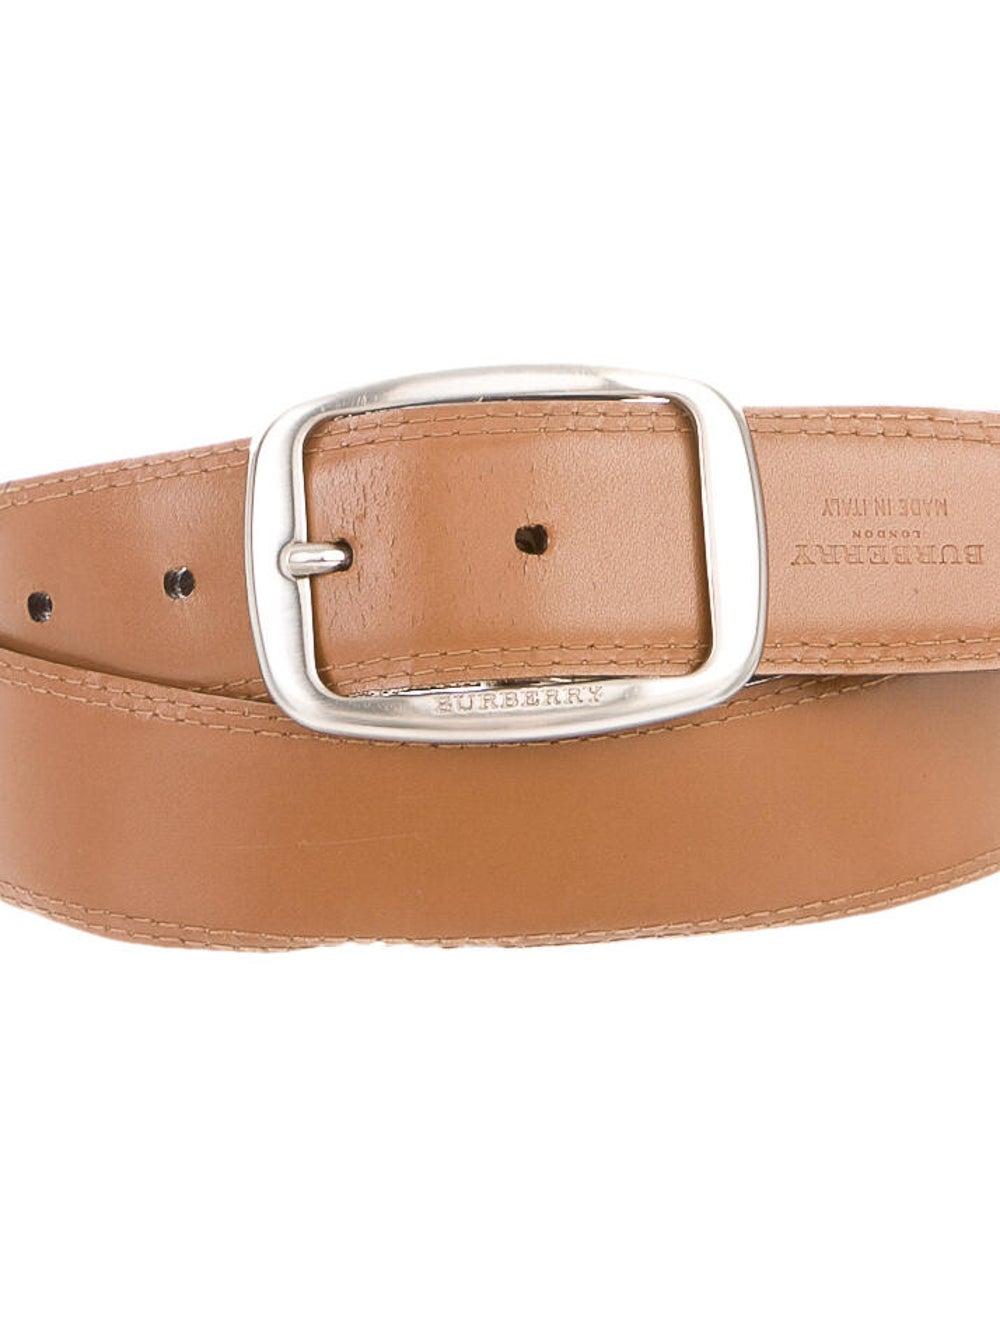 Burberry Reversible Leather Belt black - image 2